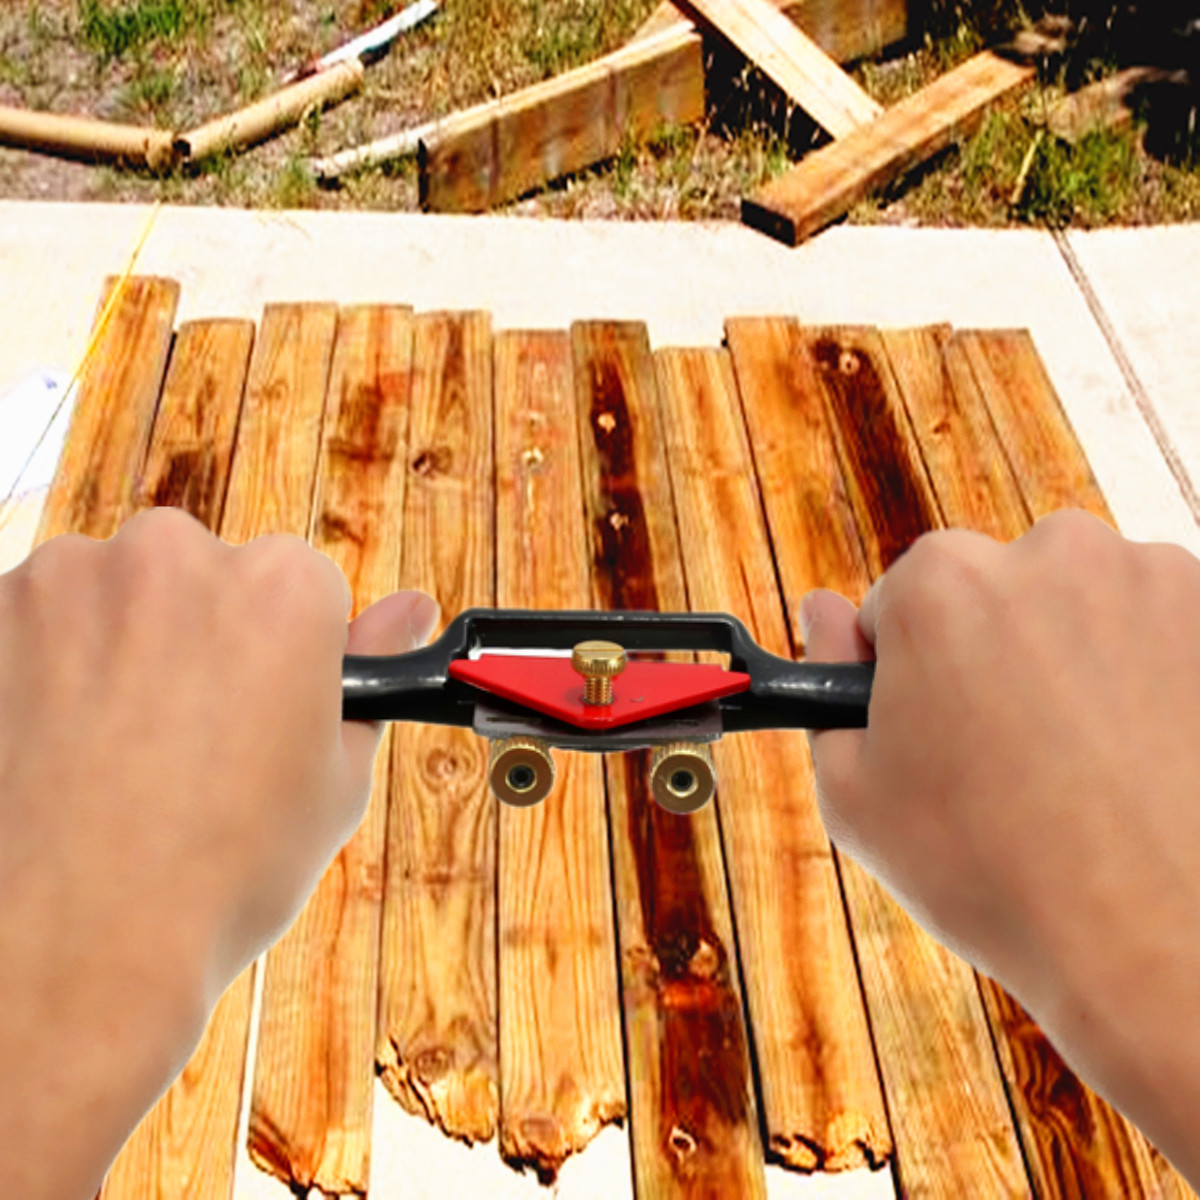 9 Inch Adjustable Wood Craft Metal Blade Spoke Shave Plane Woodworking Hand Tool